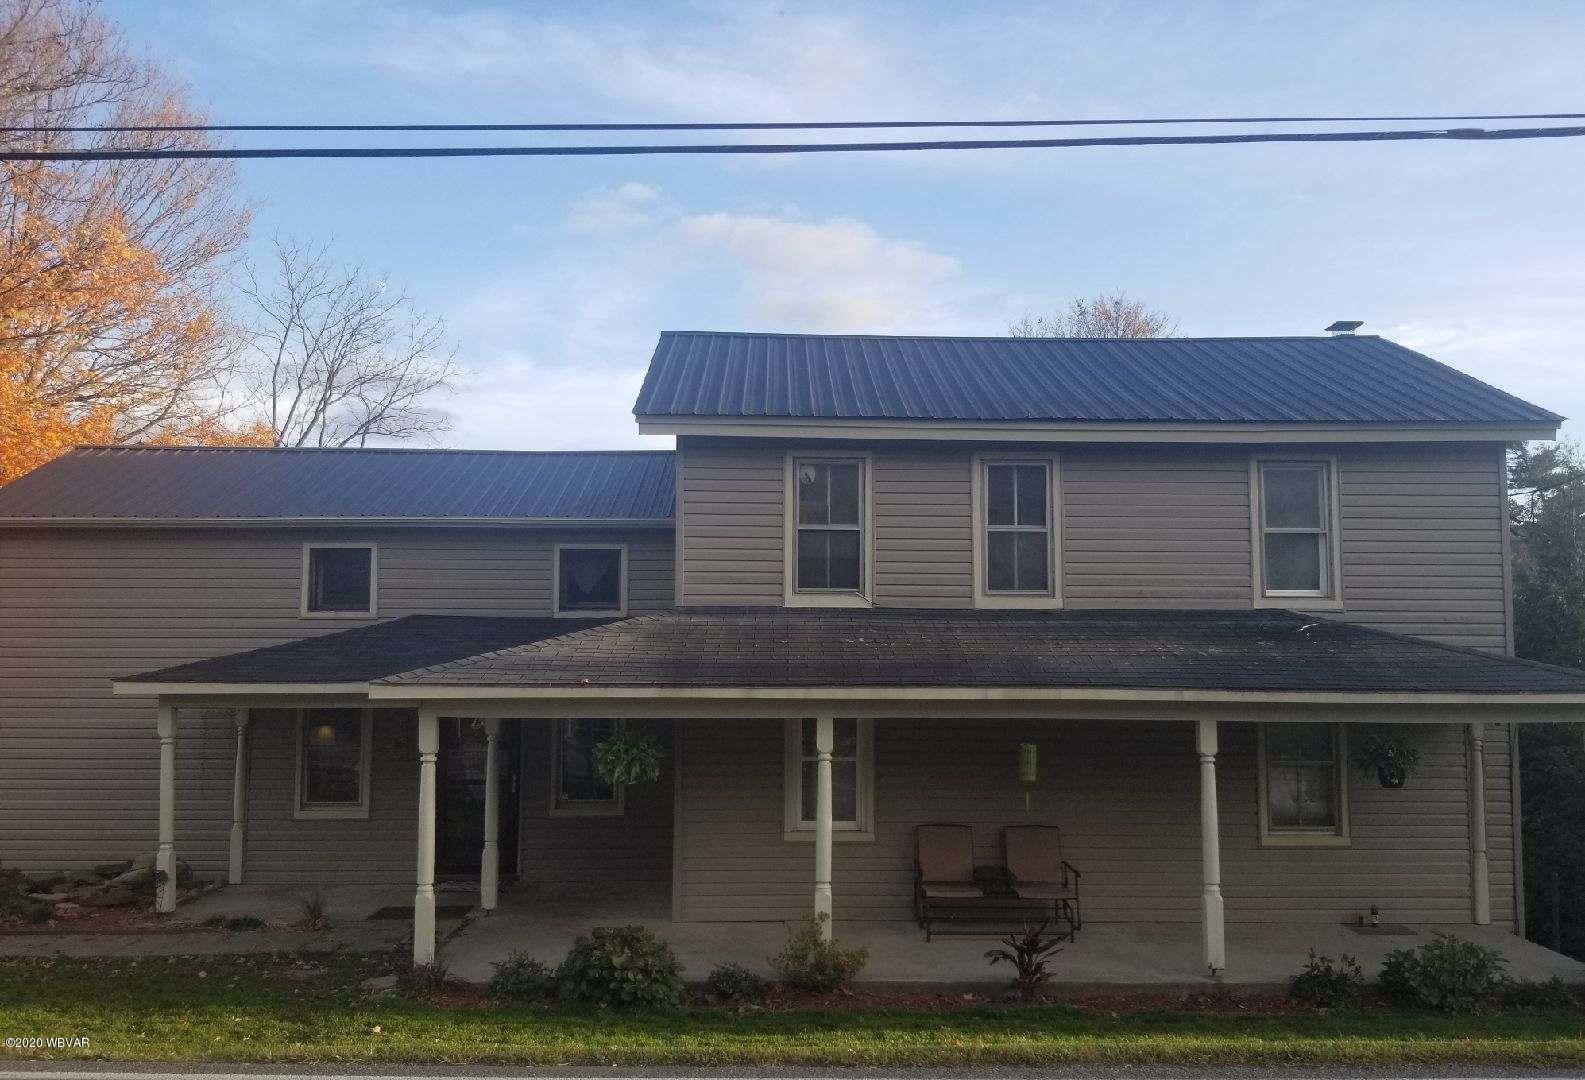 1379 VALLEY ROAD, Loganton, PA 17747, 3 Bedrooms Bedrooms, ,3 BathroomsBathrooms,Residential,For sale,VALLEY,WB-91408